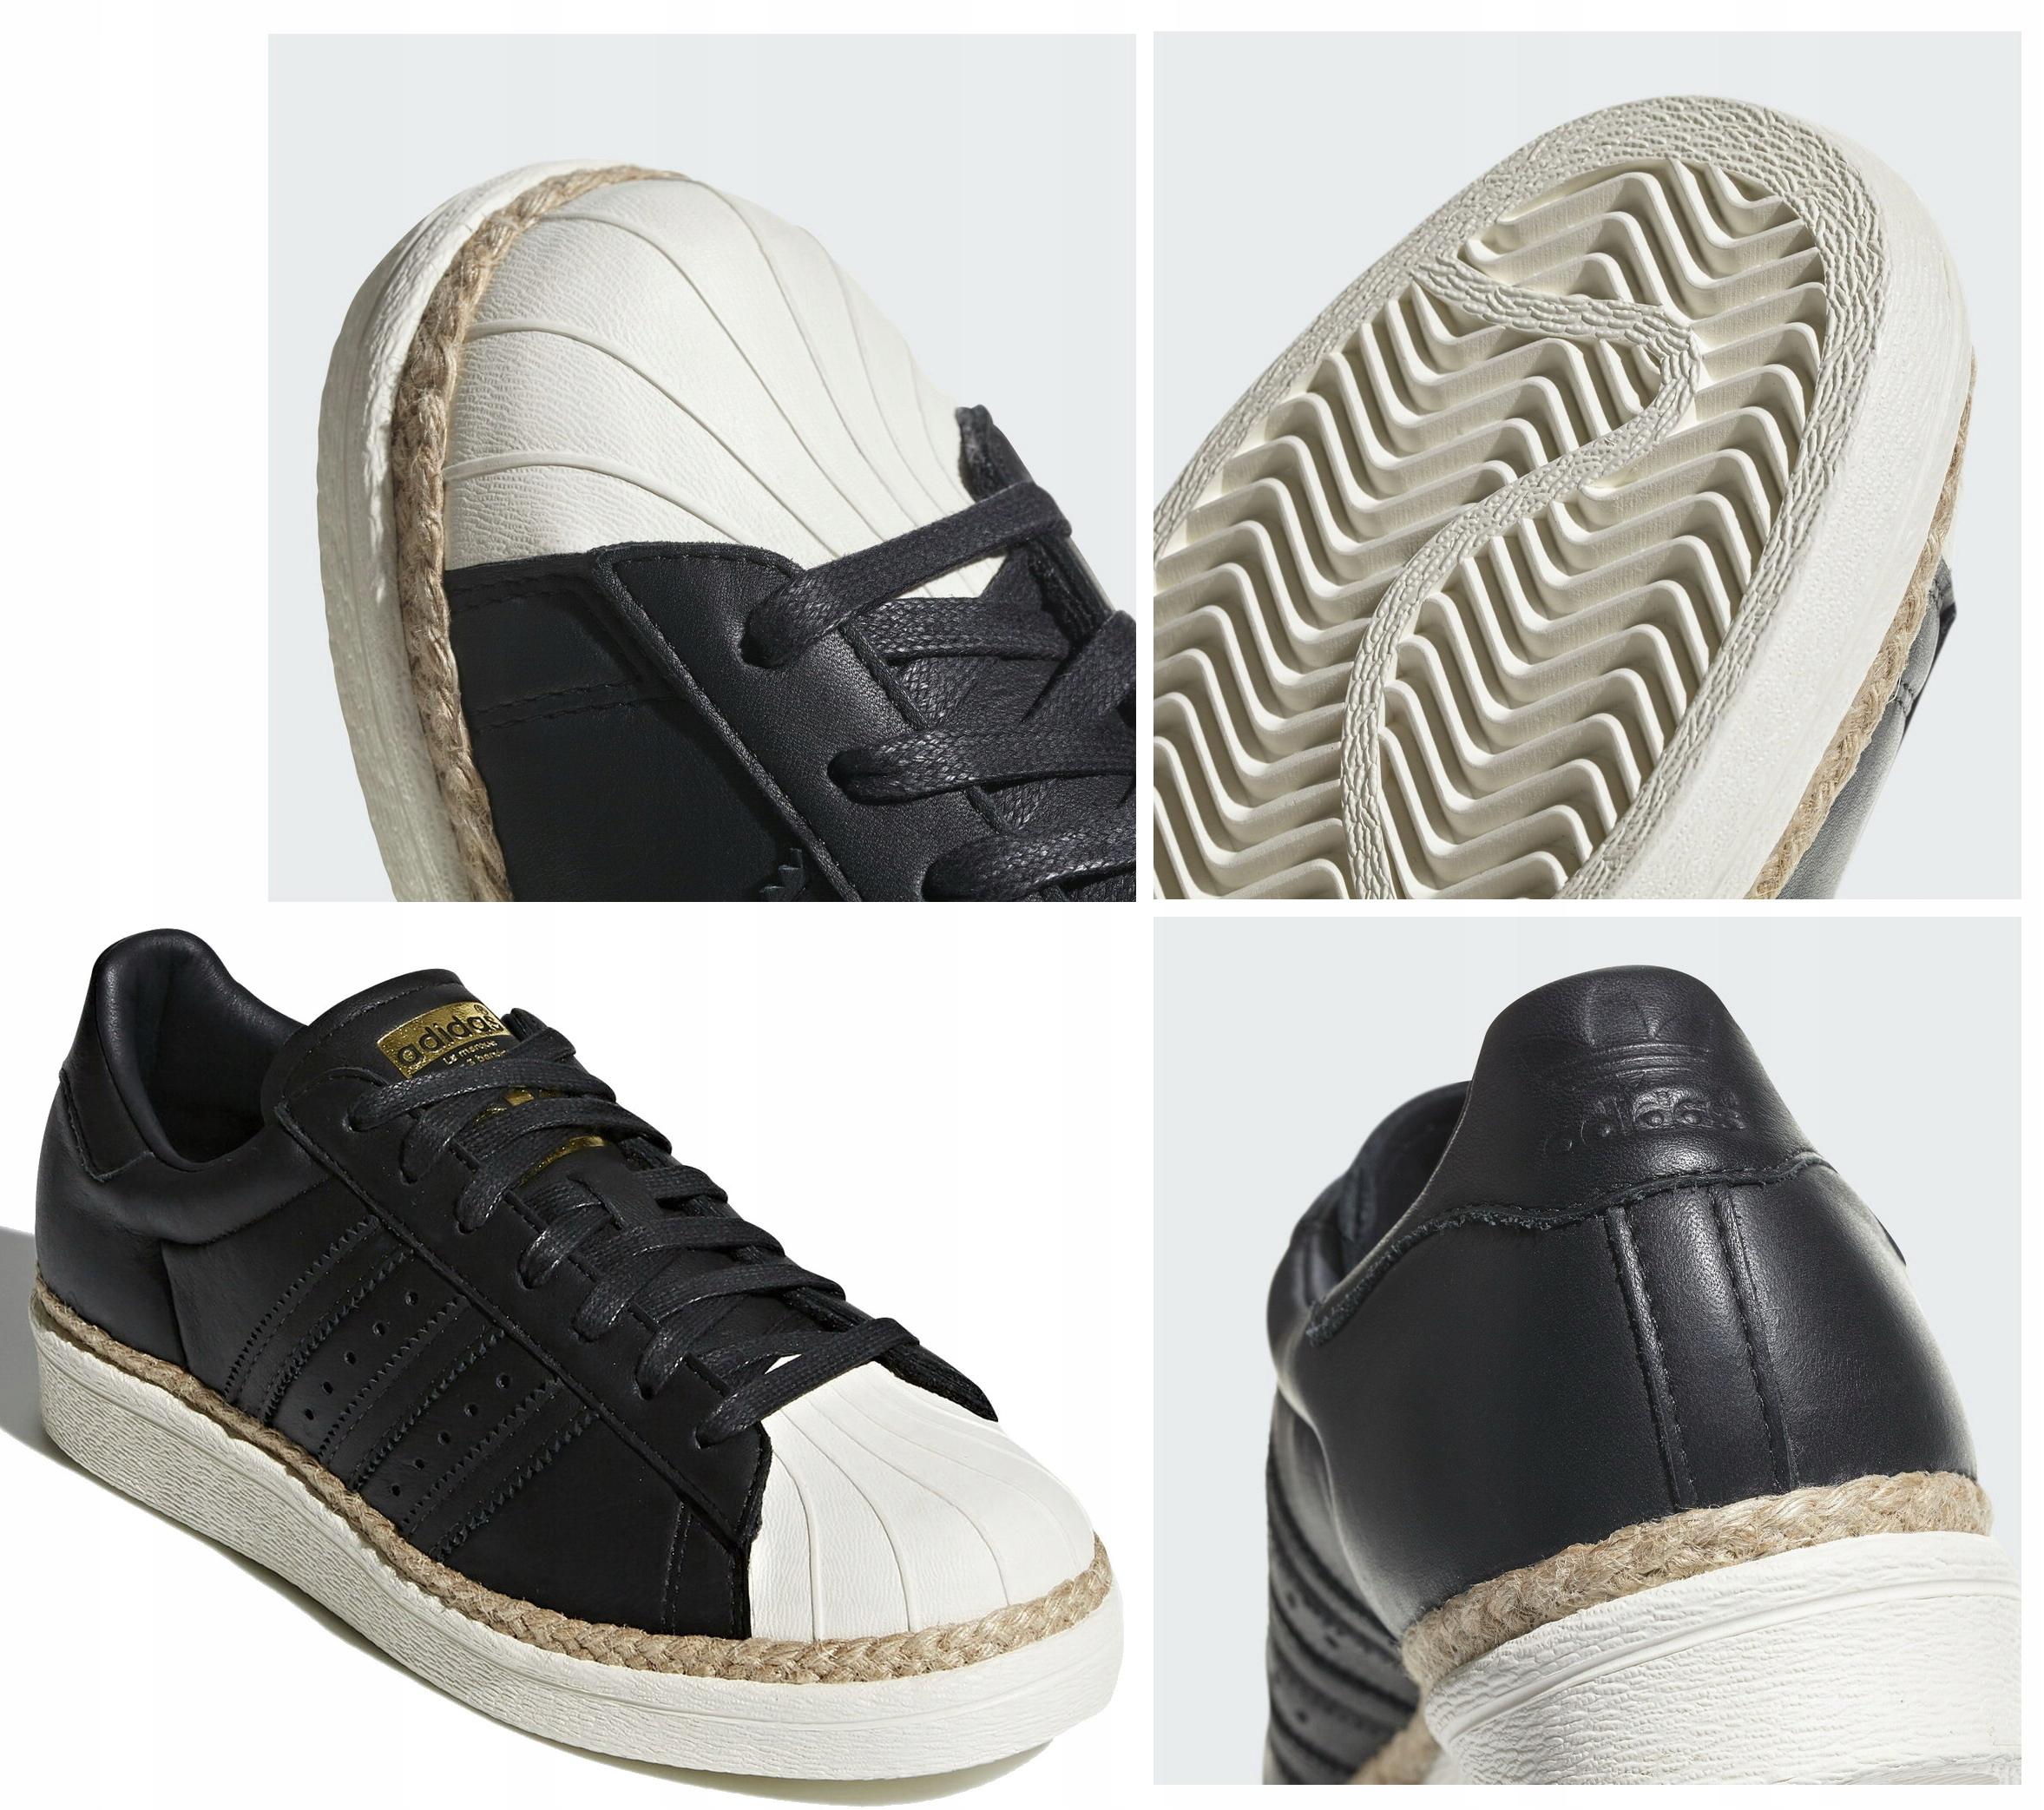 Buty adidas SUPERSTAR 80s na Allegro kupuj taniej online